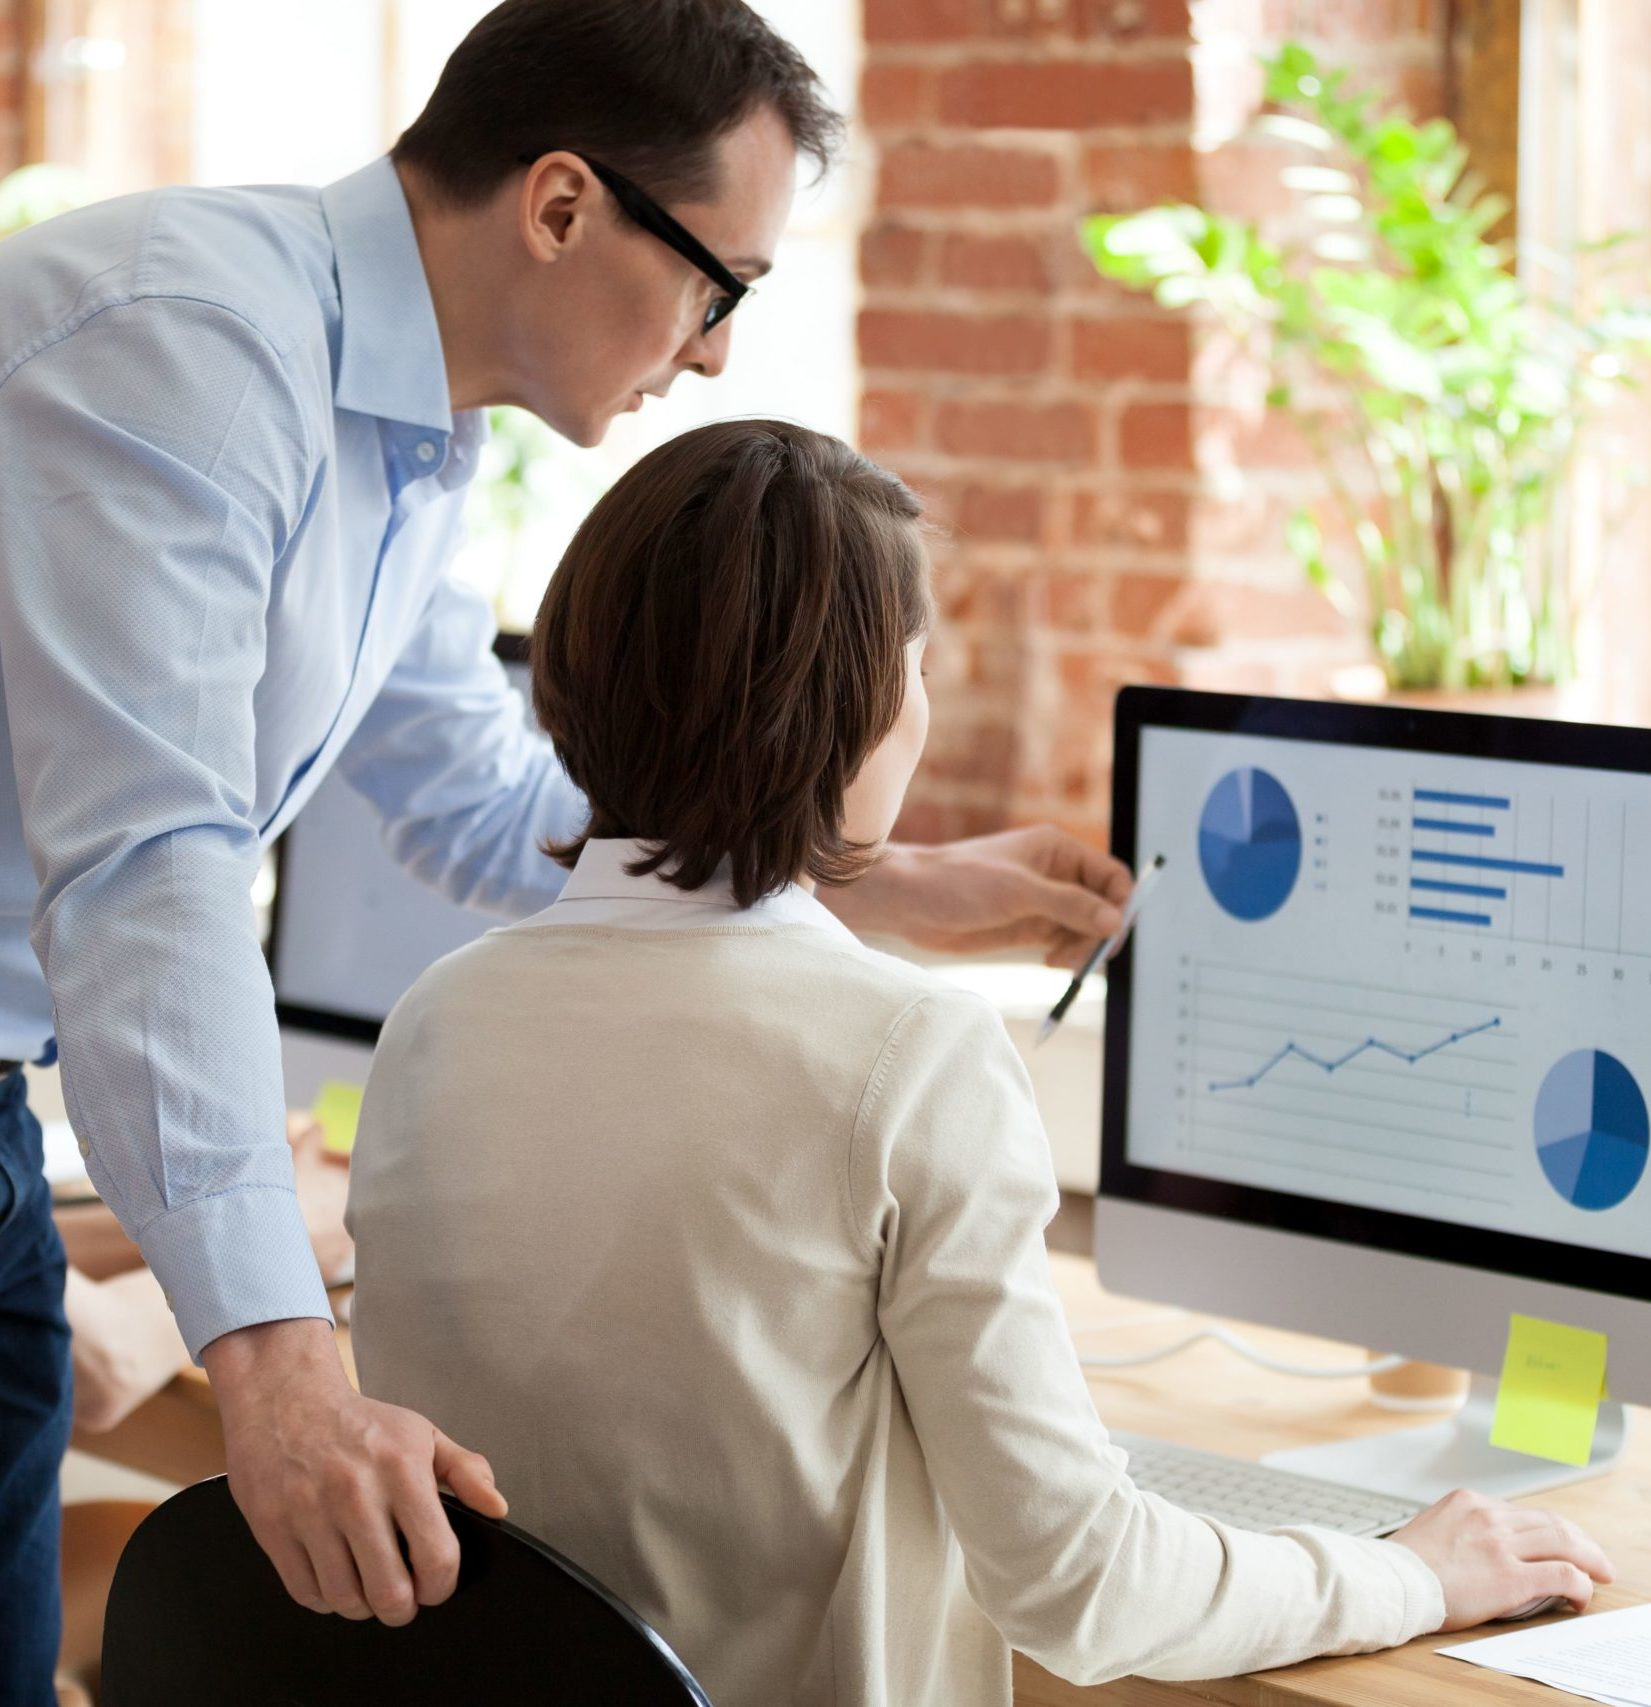 MYOB ERP Consultant assisting user